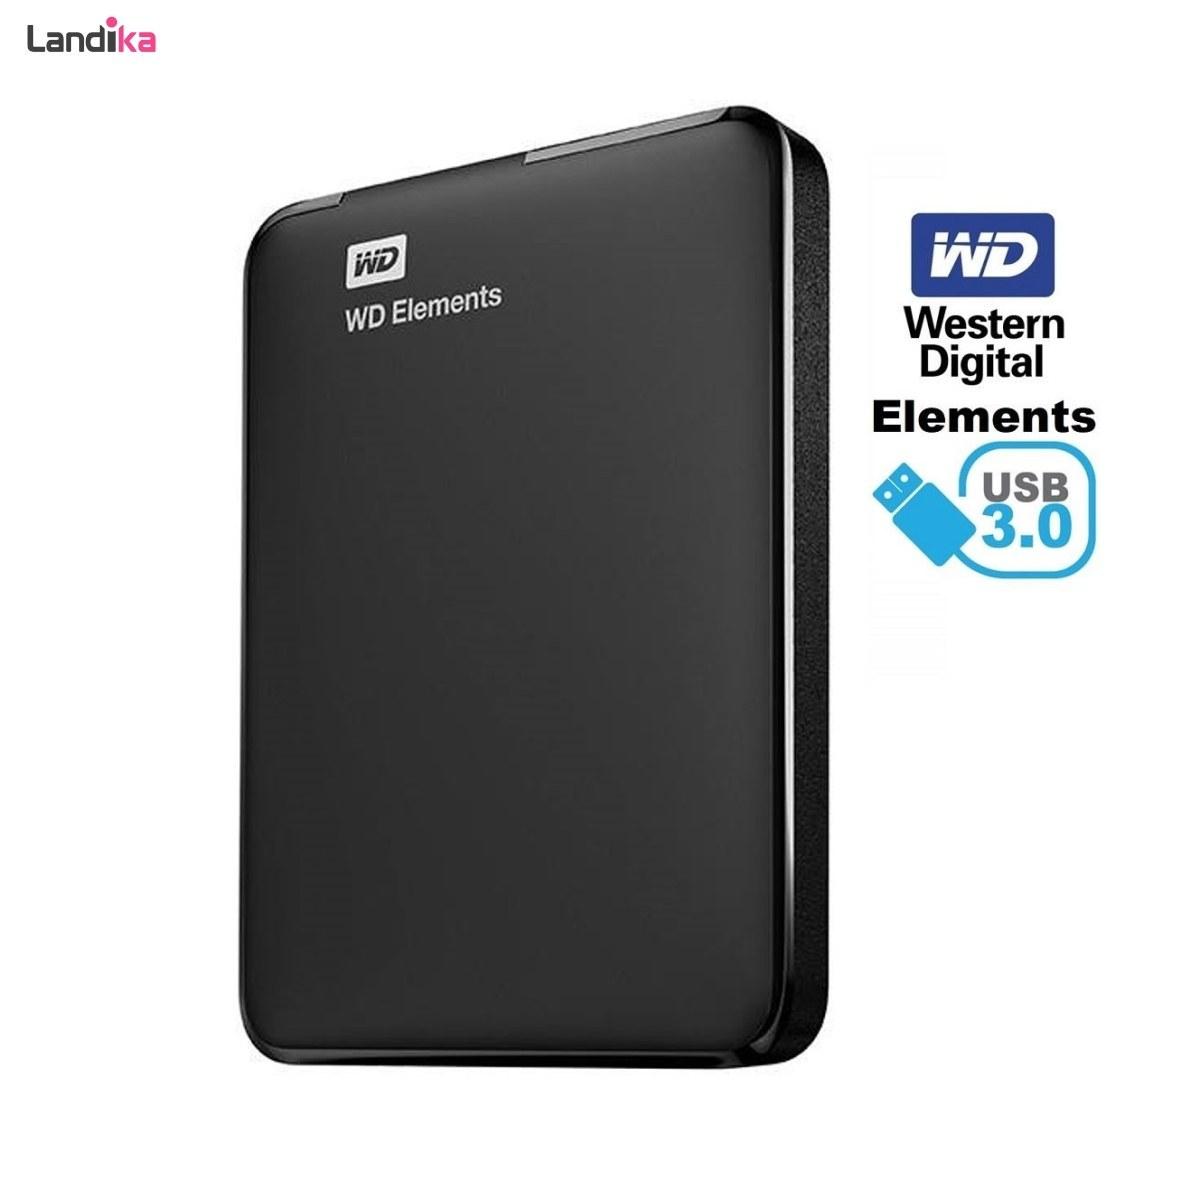 تصویر هارد اکسترنال وسترن دیجیتال مدل Elements ظرفیت 250 گیگابایت Western Digital Elements External Hard Drive - 250GB